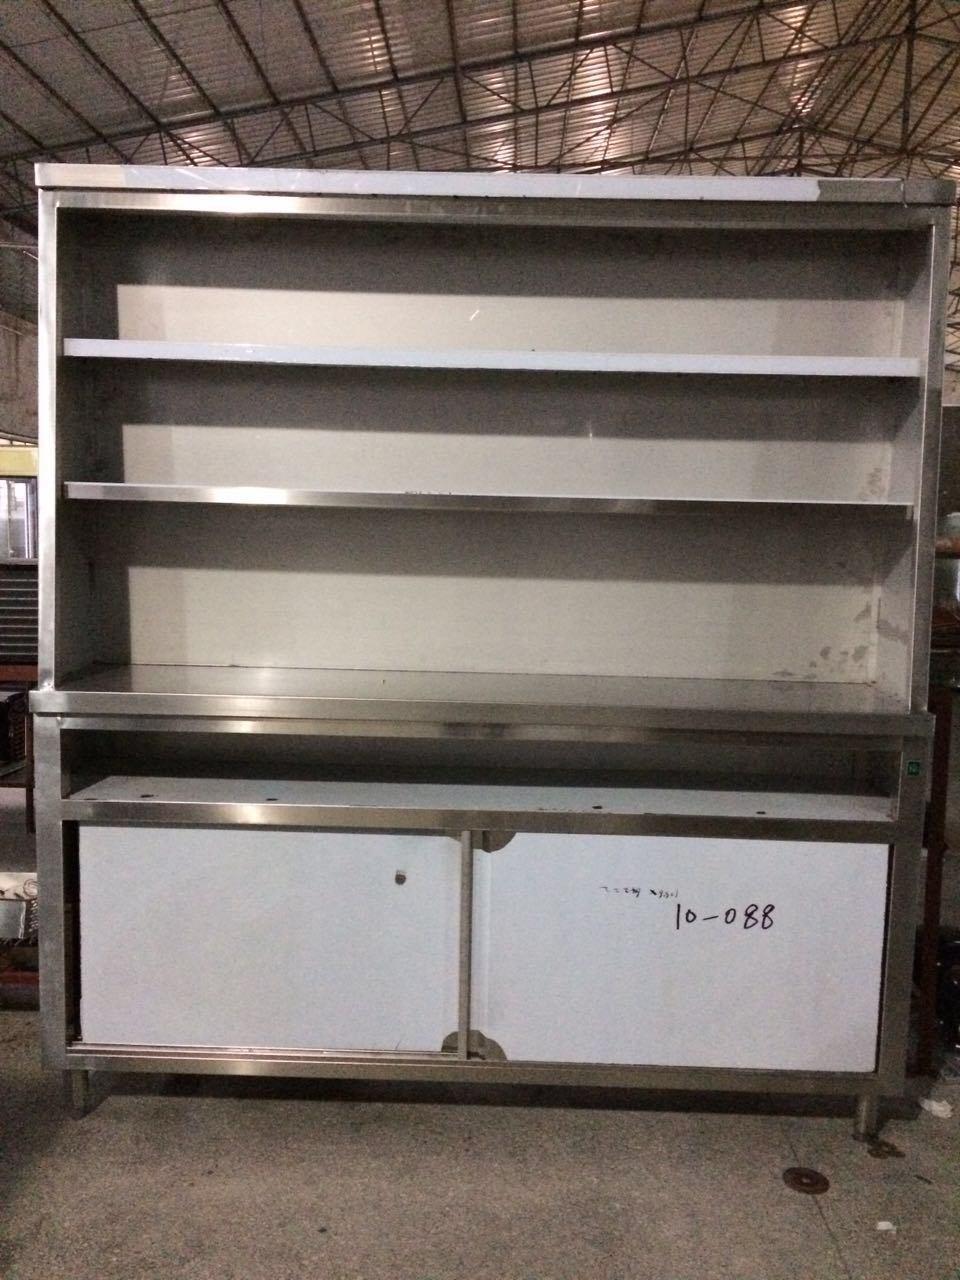 Vertical Stainless Steel Deck Food Storage Cabinet For Restaurant